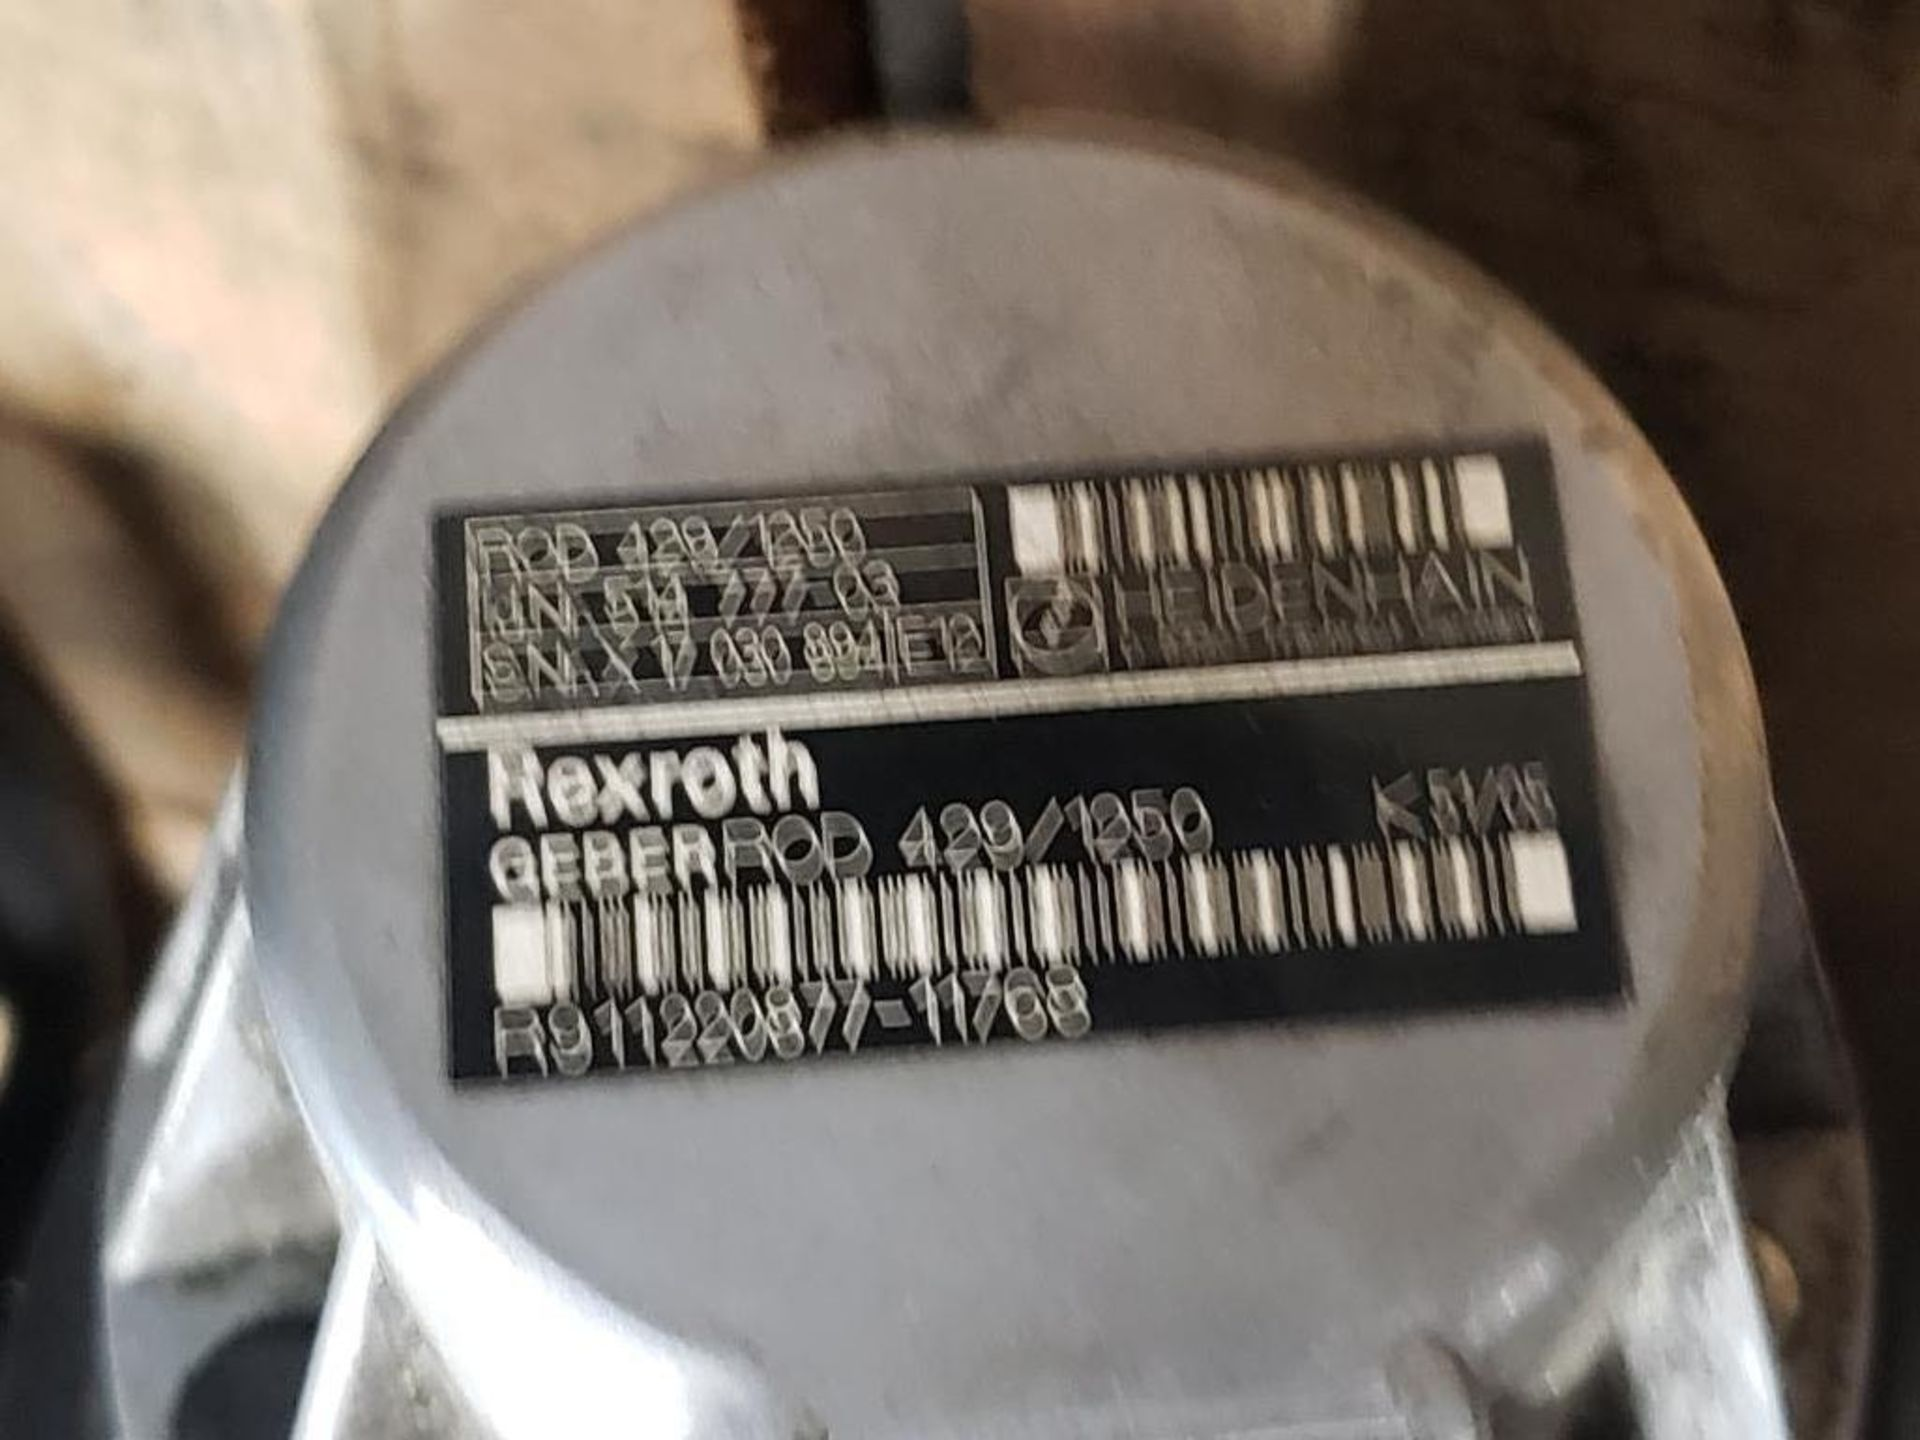 Rexroth GEBERROD 420/1250 Servo motor. Heidenhain 514.777-03 Encoder. - Image 4 of 4